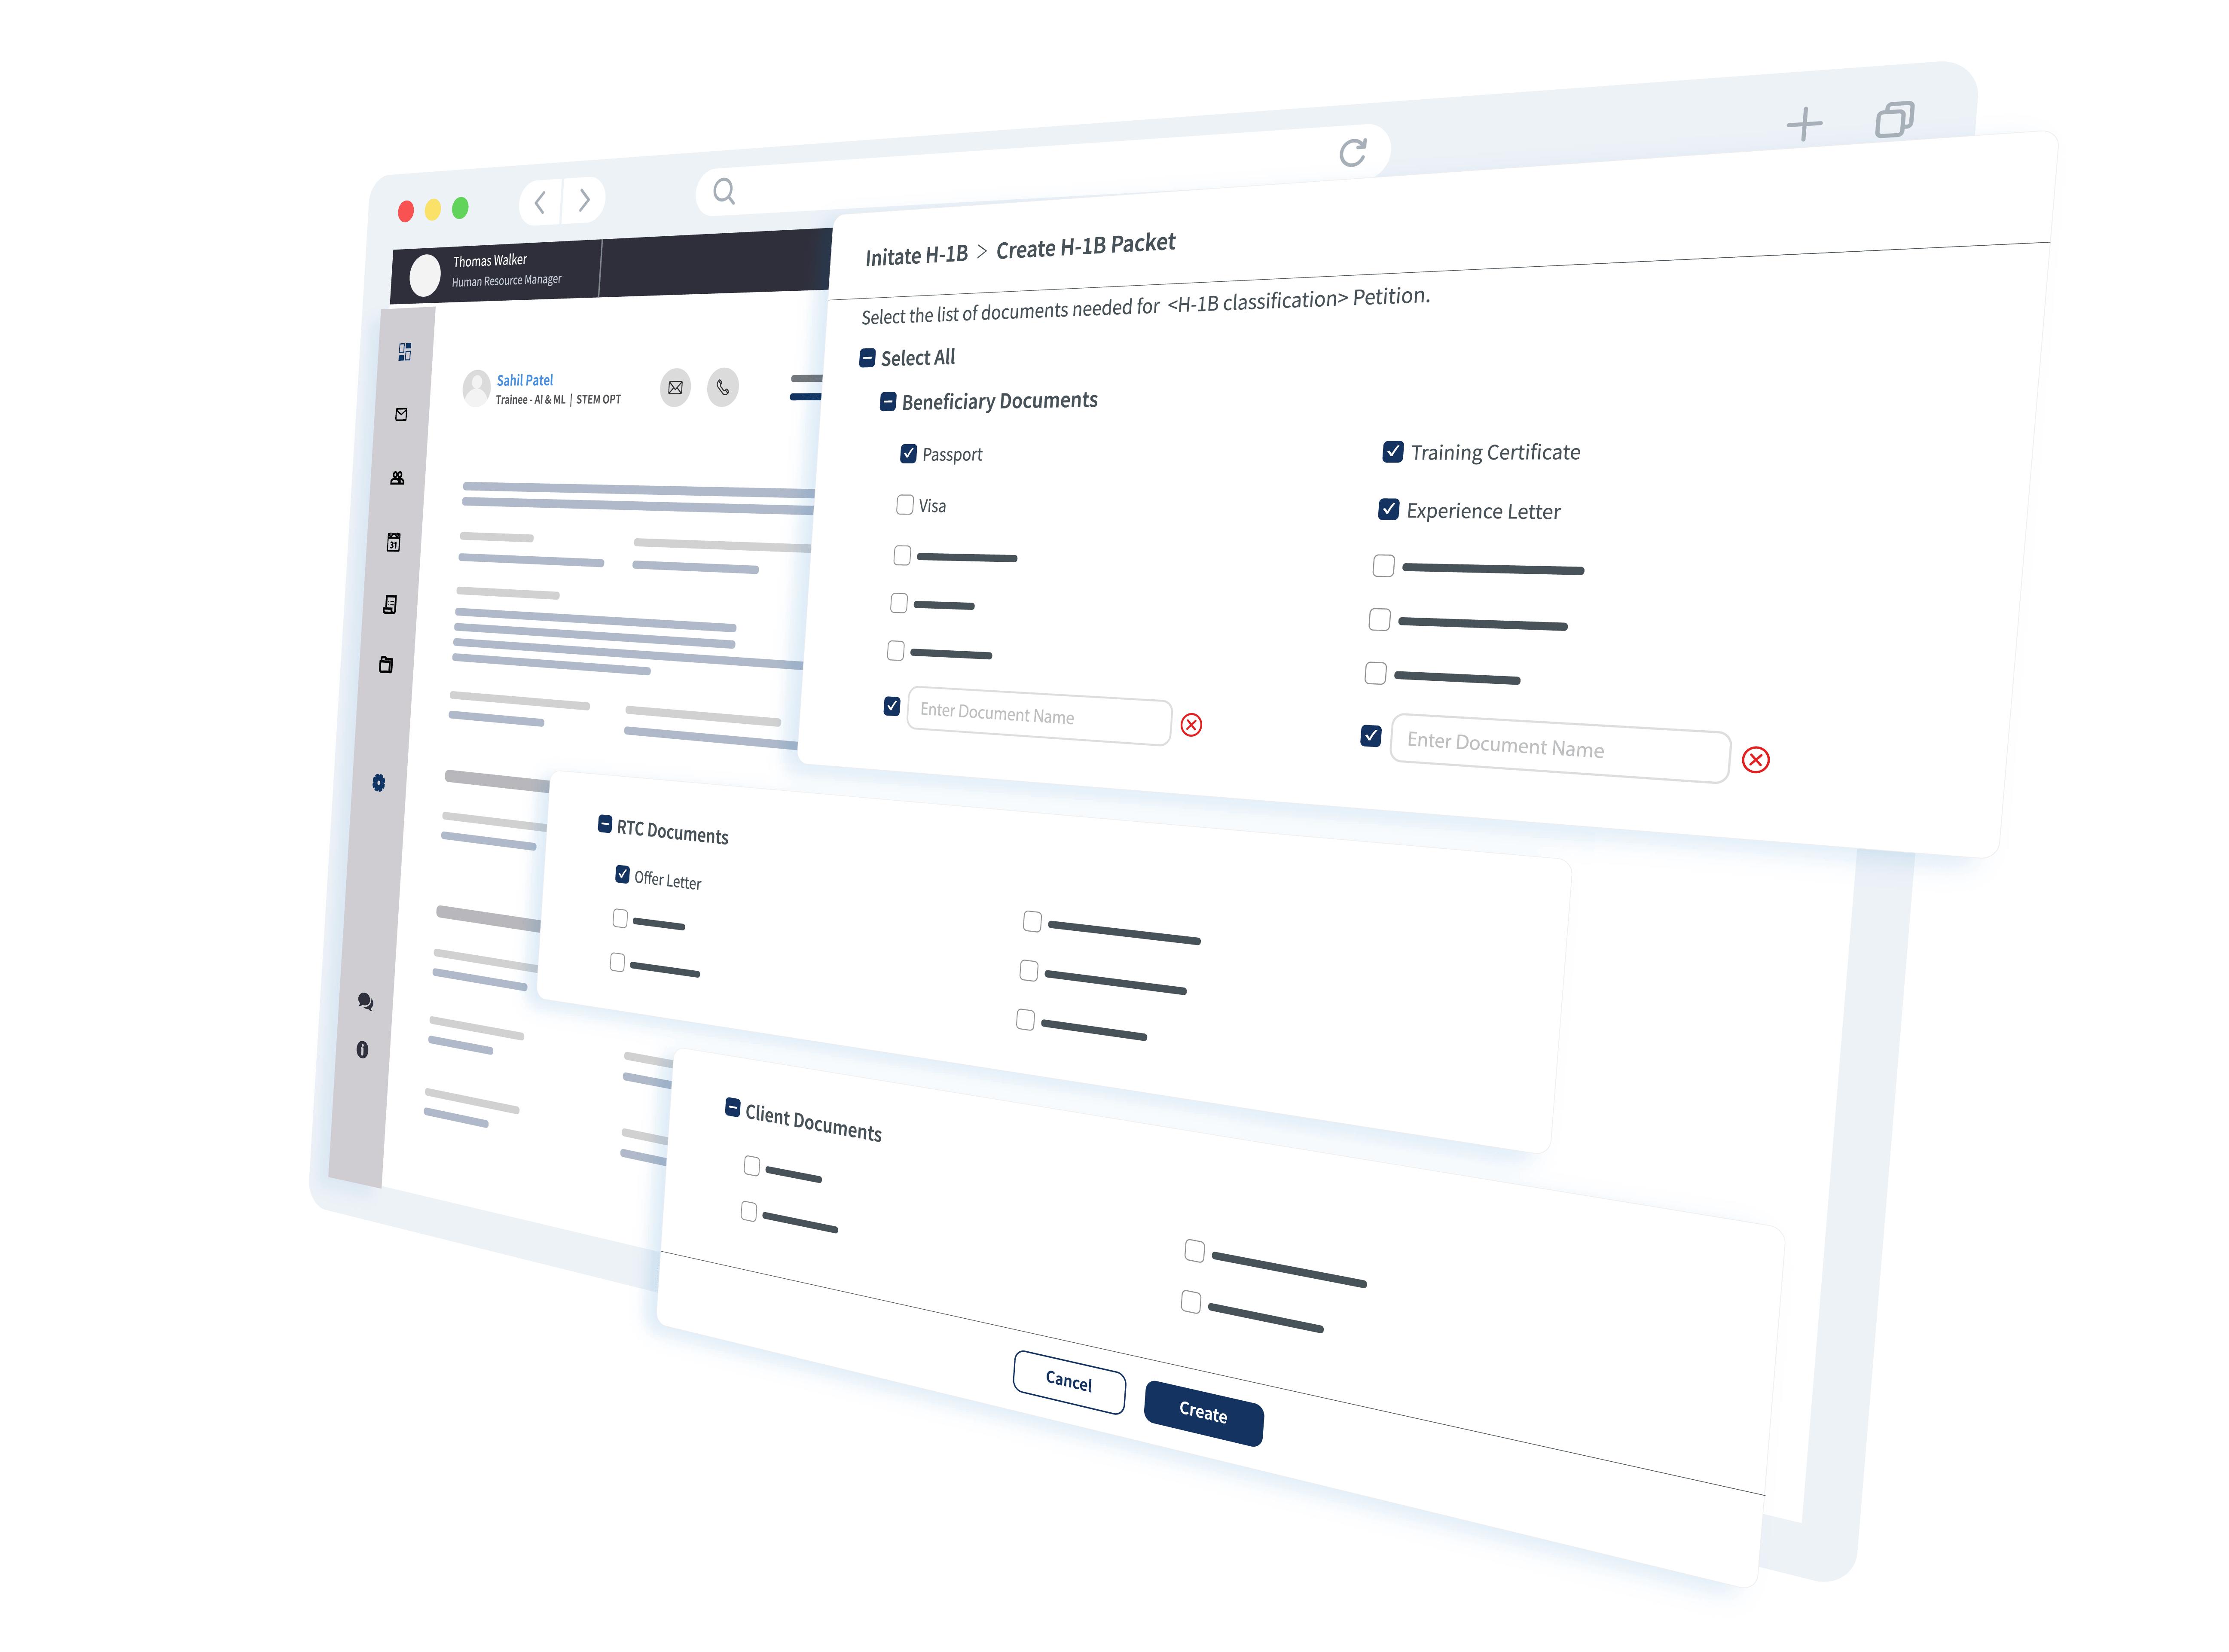 h-1b document checklist